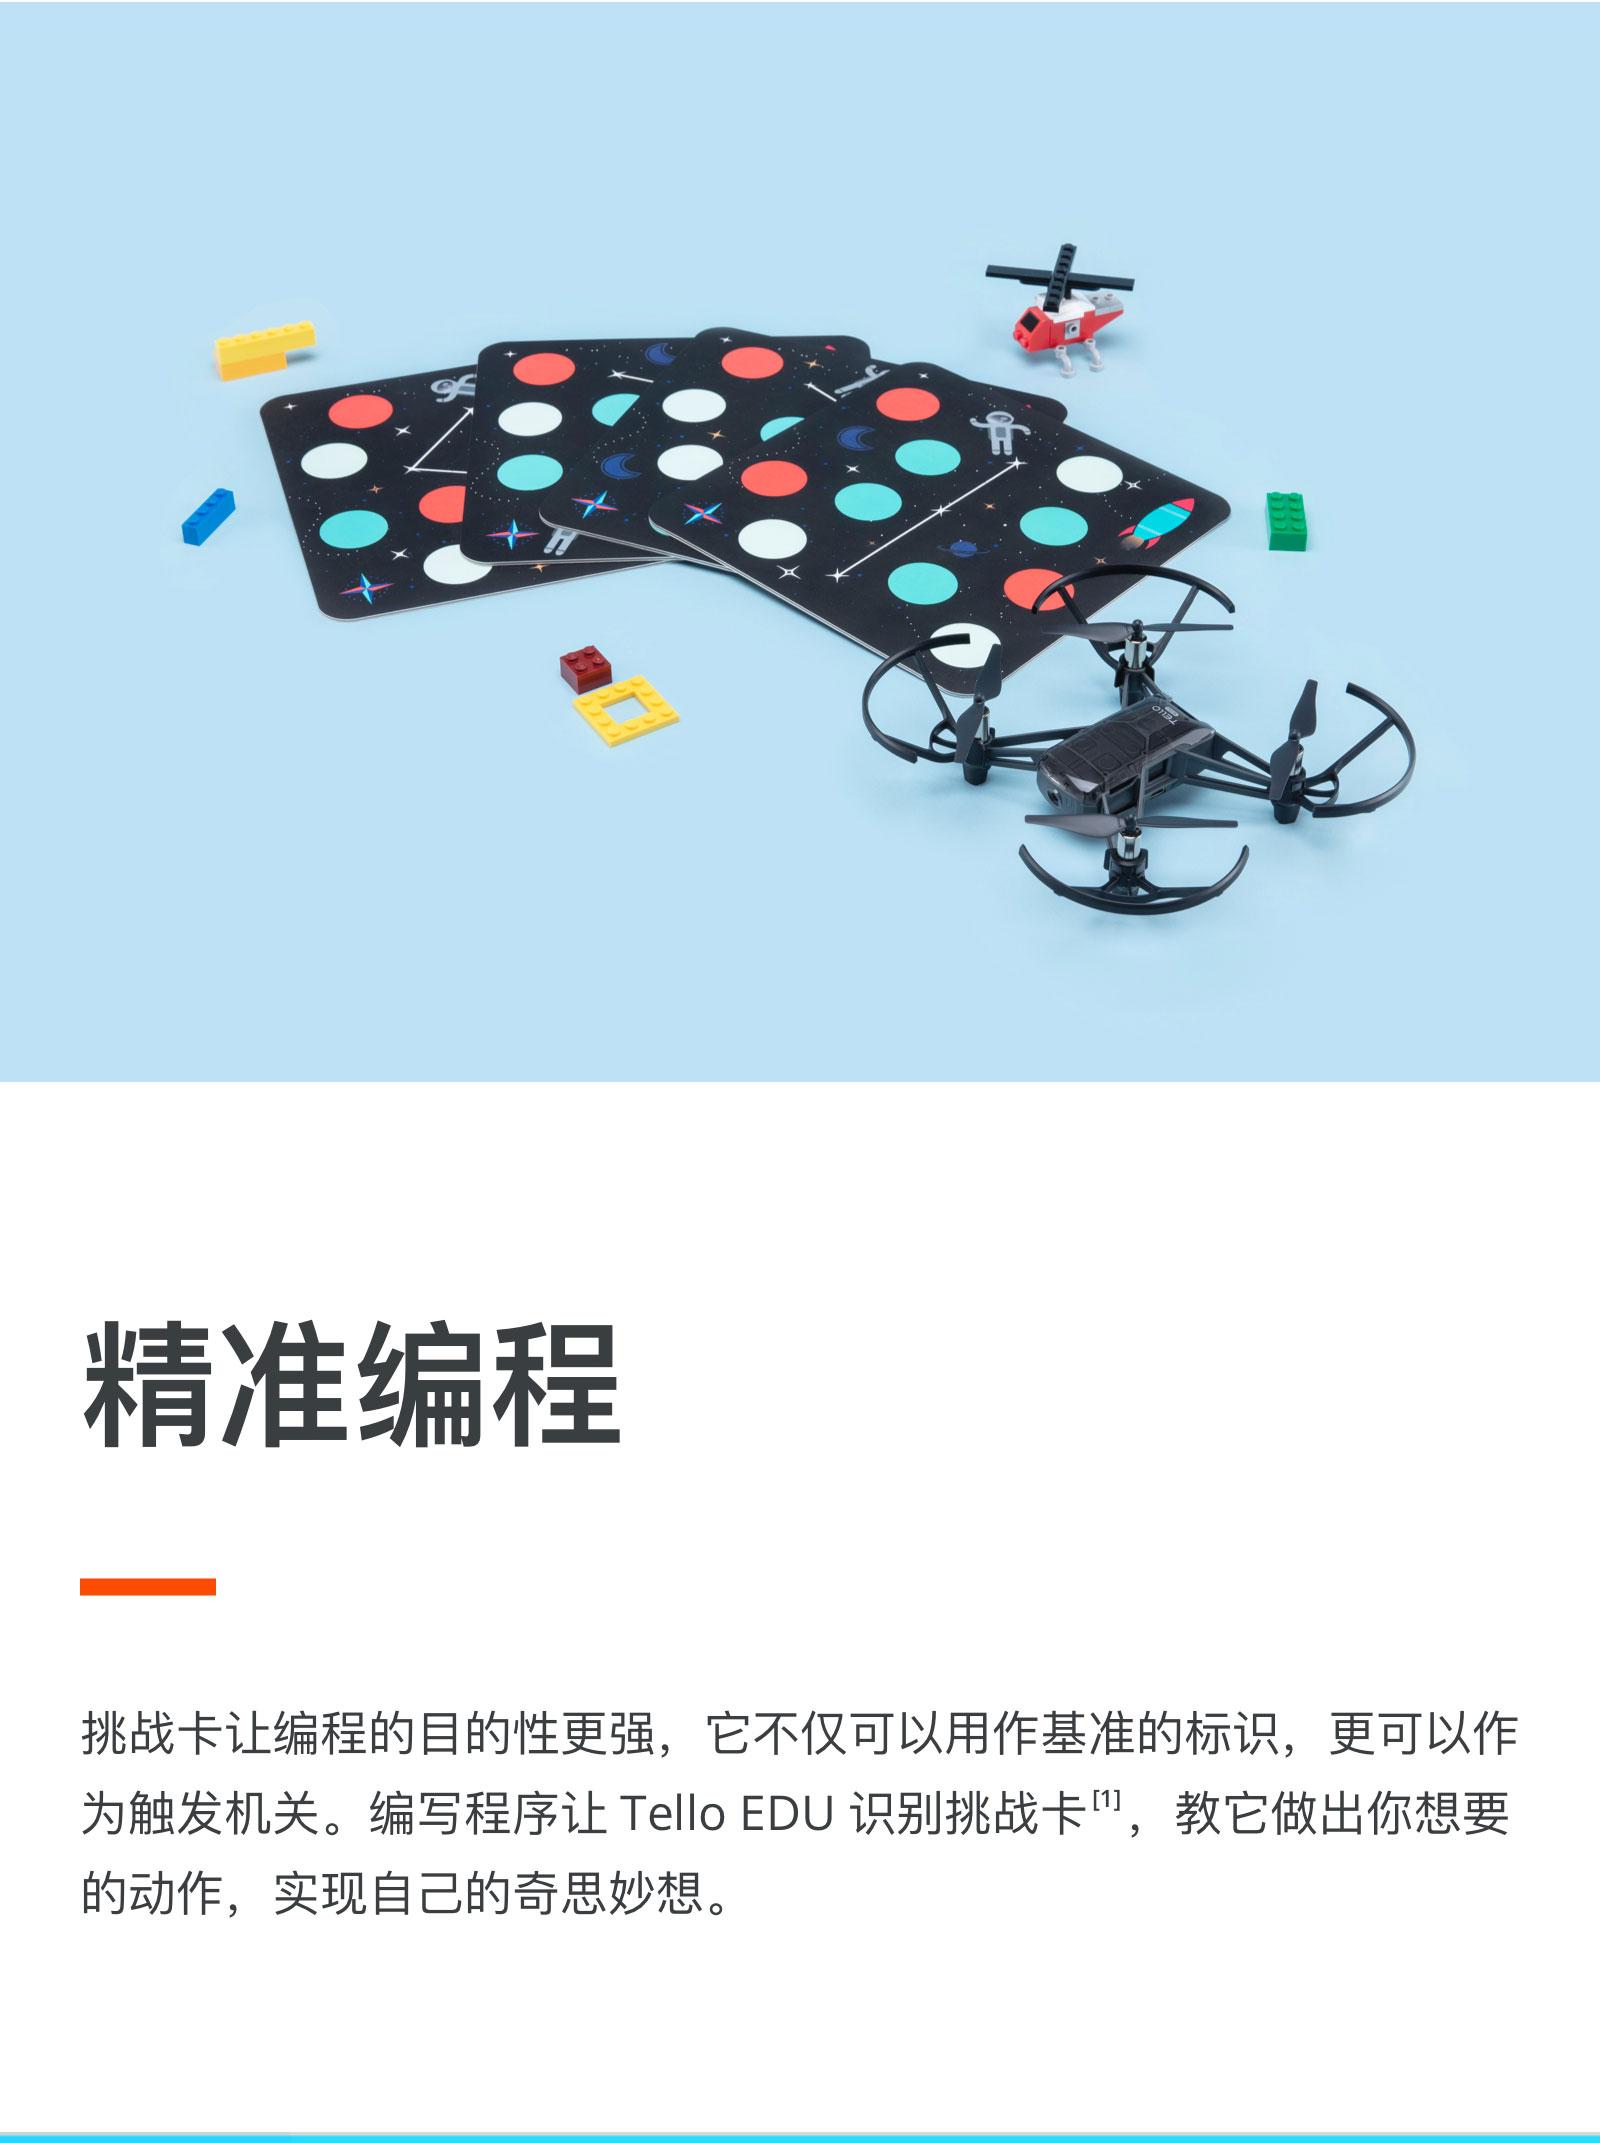 tello-edu-cn-m800-copy_04.jpg